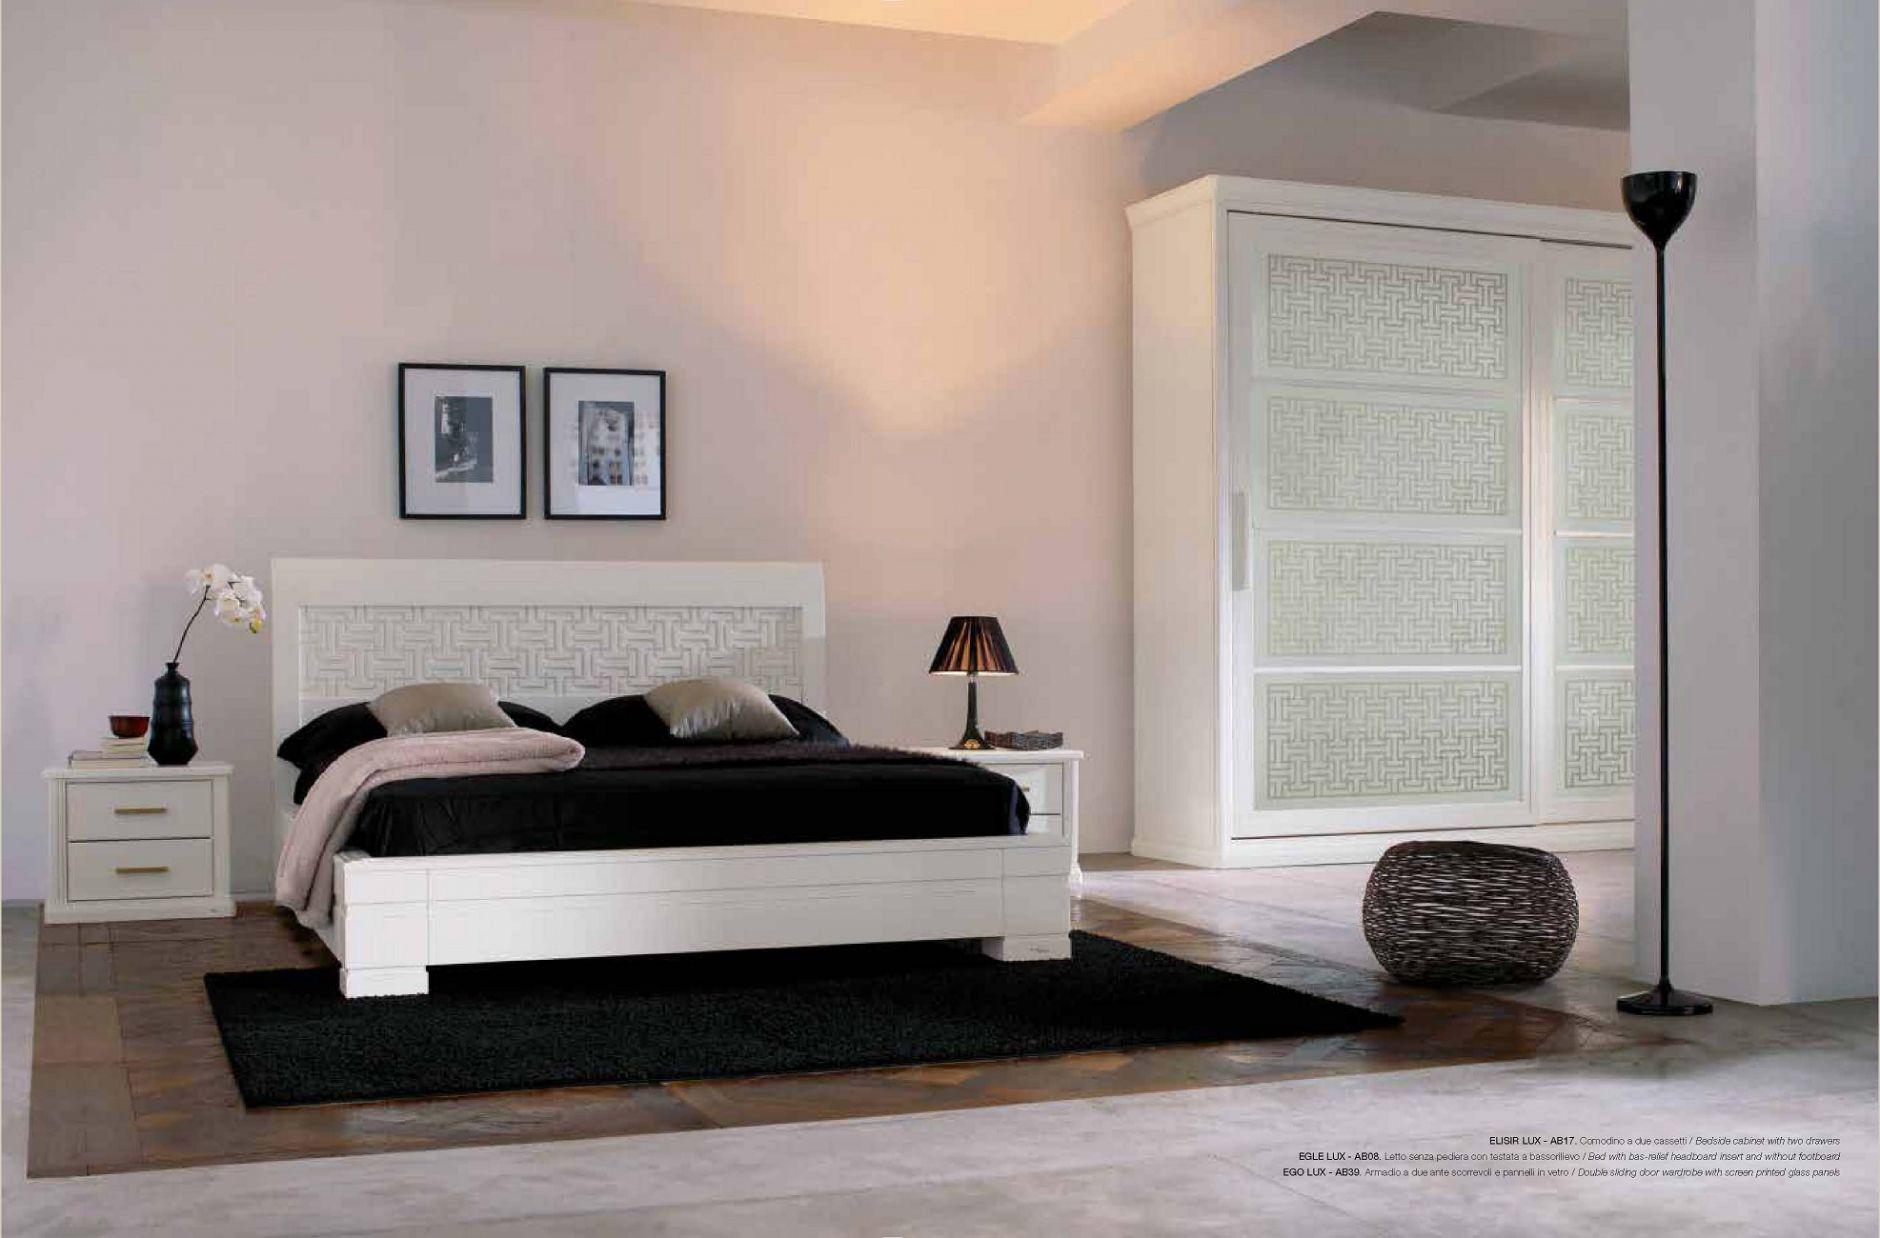 Schlafzimmer - Schlafzimmer Accademia del Mobile Serie L\'ESPRIT ...